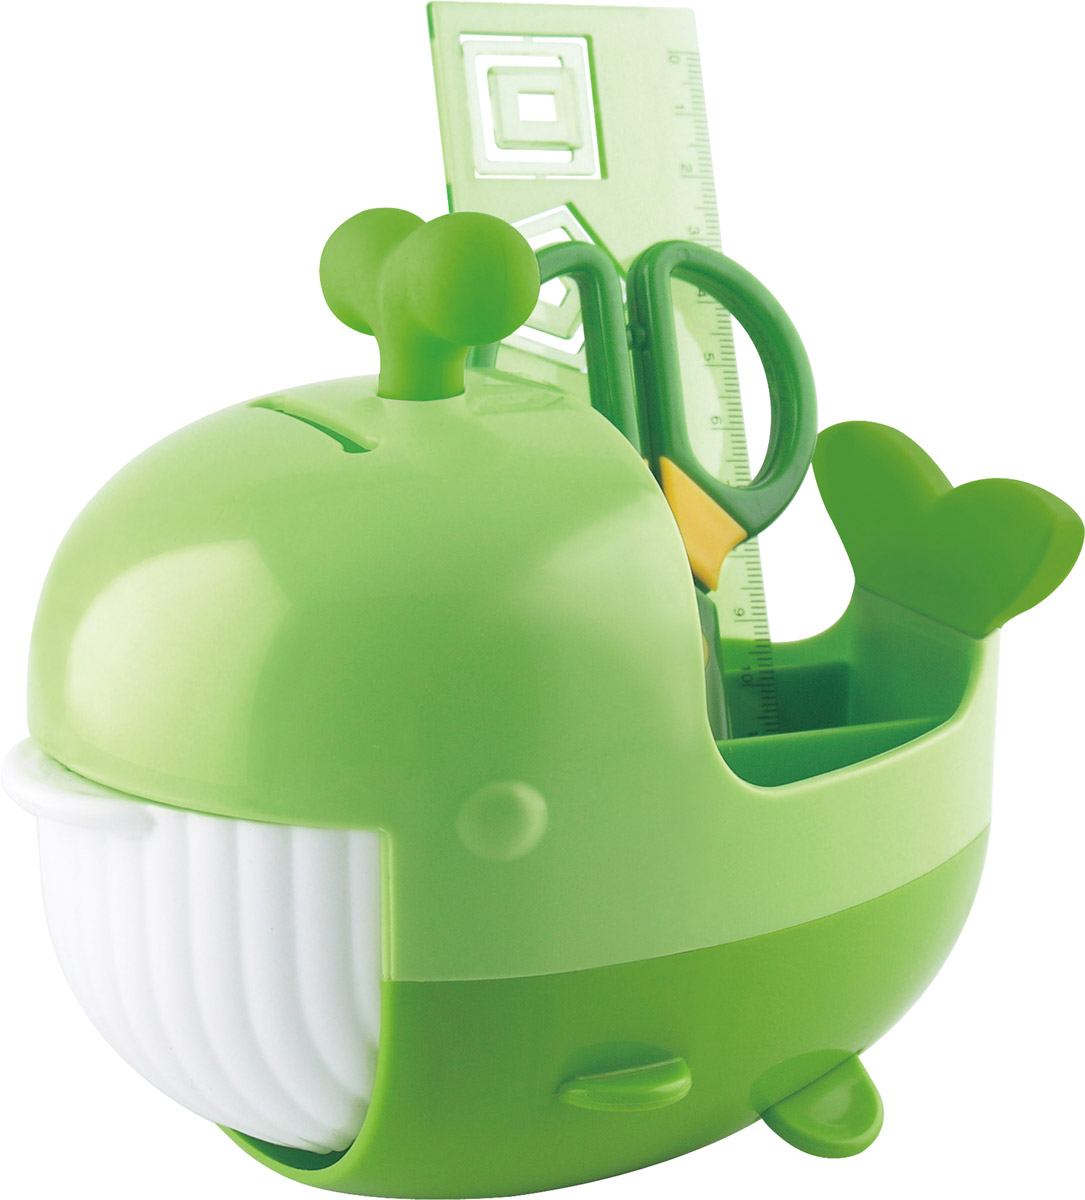 Brauberg Канцелярский набор Кит цвет зеленый 4 предмета trolls канцелярский набор 4 предмета